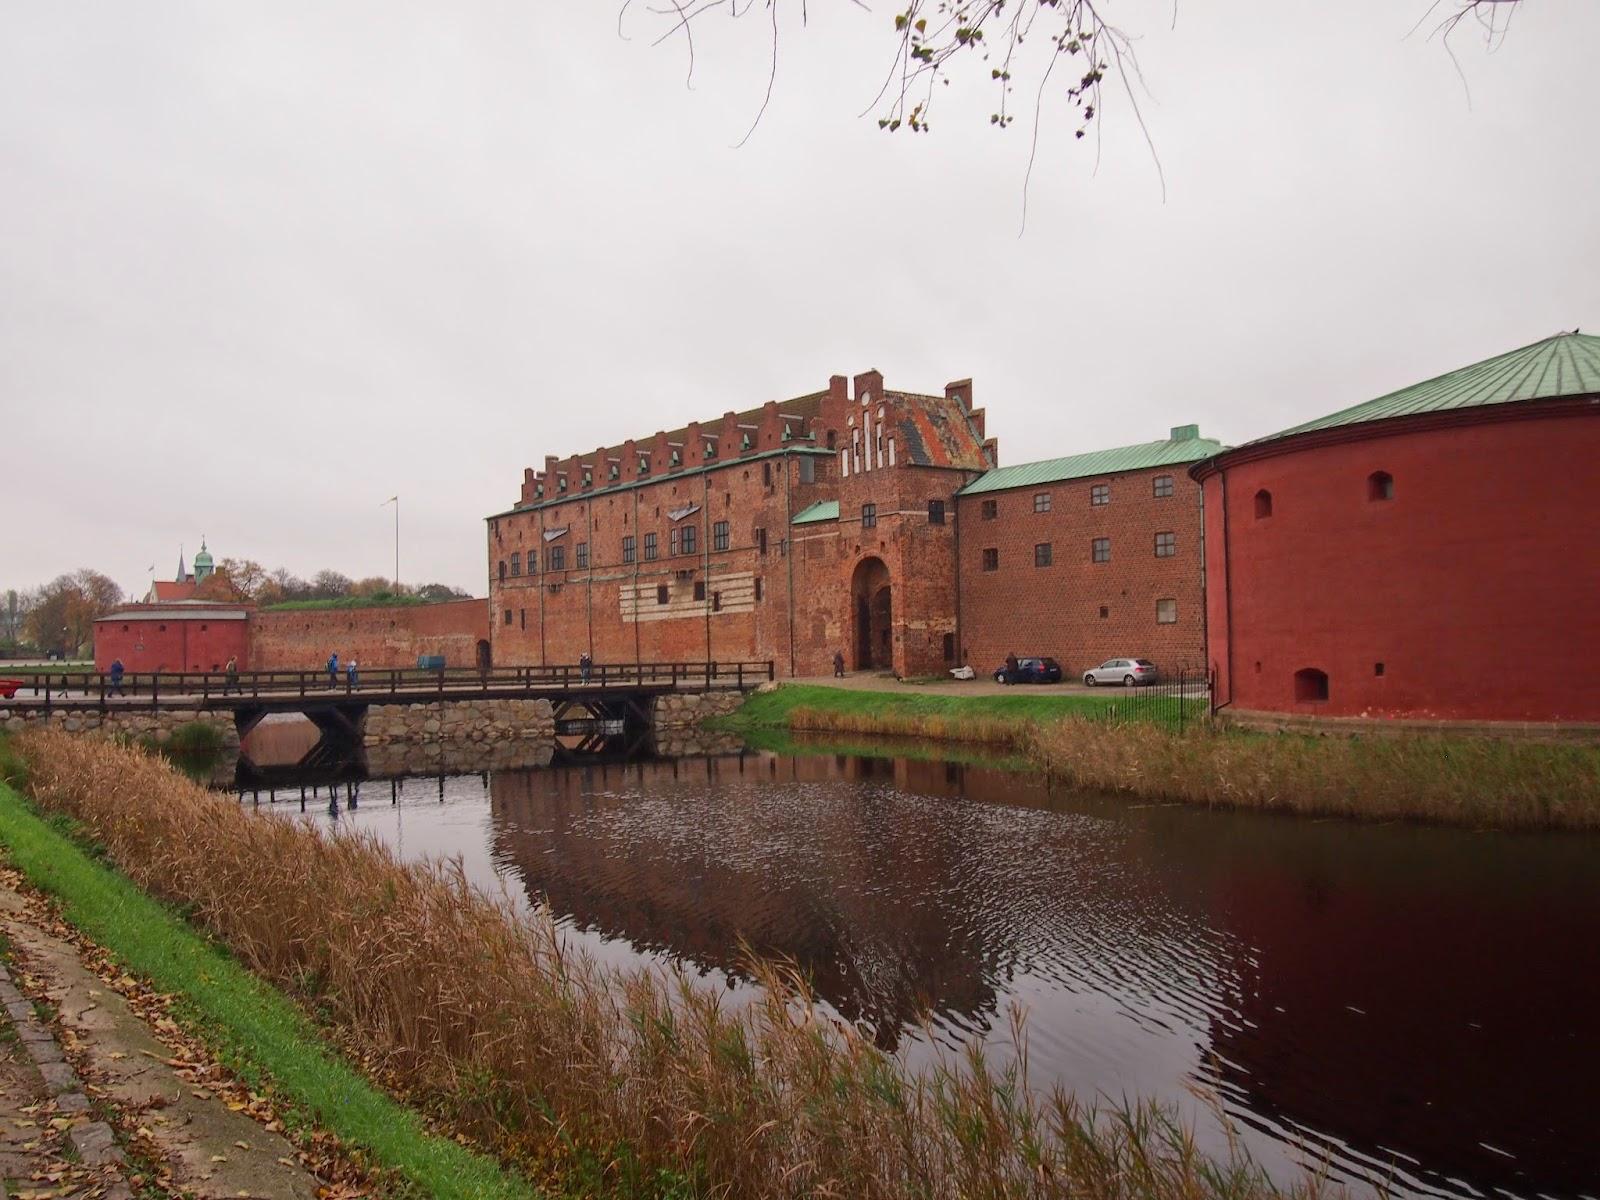 The Malmohaus Castle